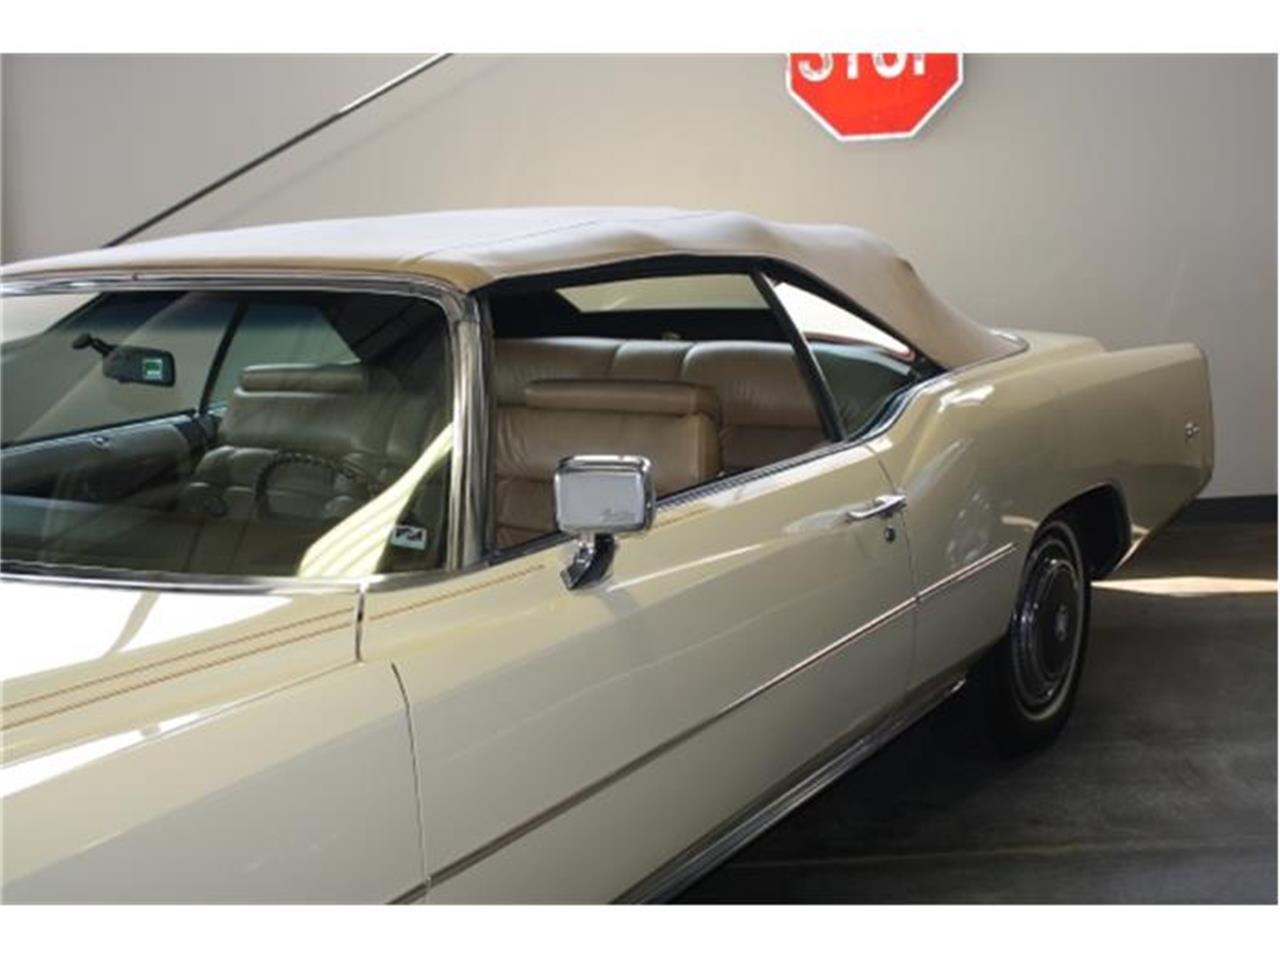 1976 Cadillac Eldorado (CC-643236) for sale in Branson, Missouri